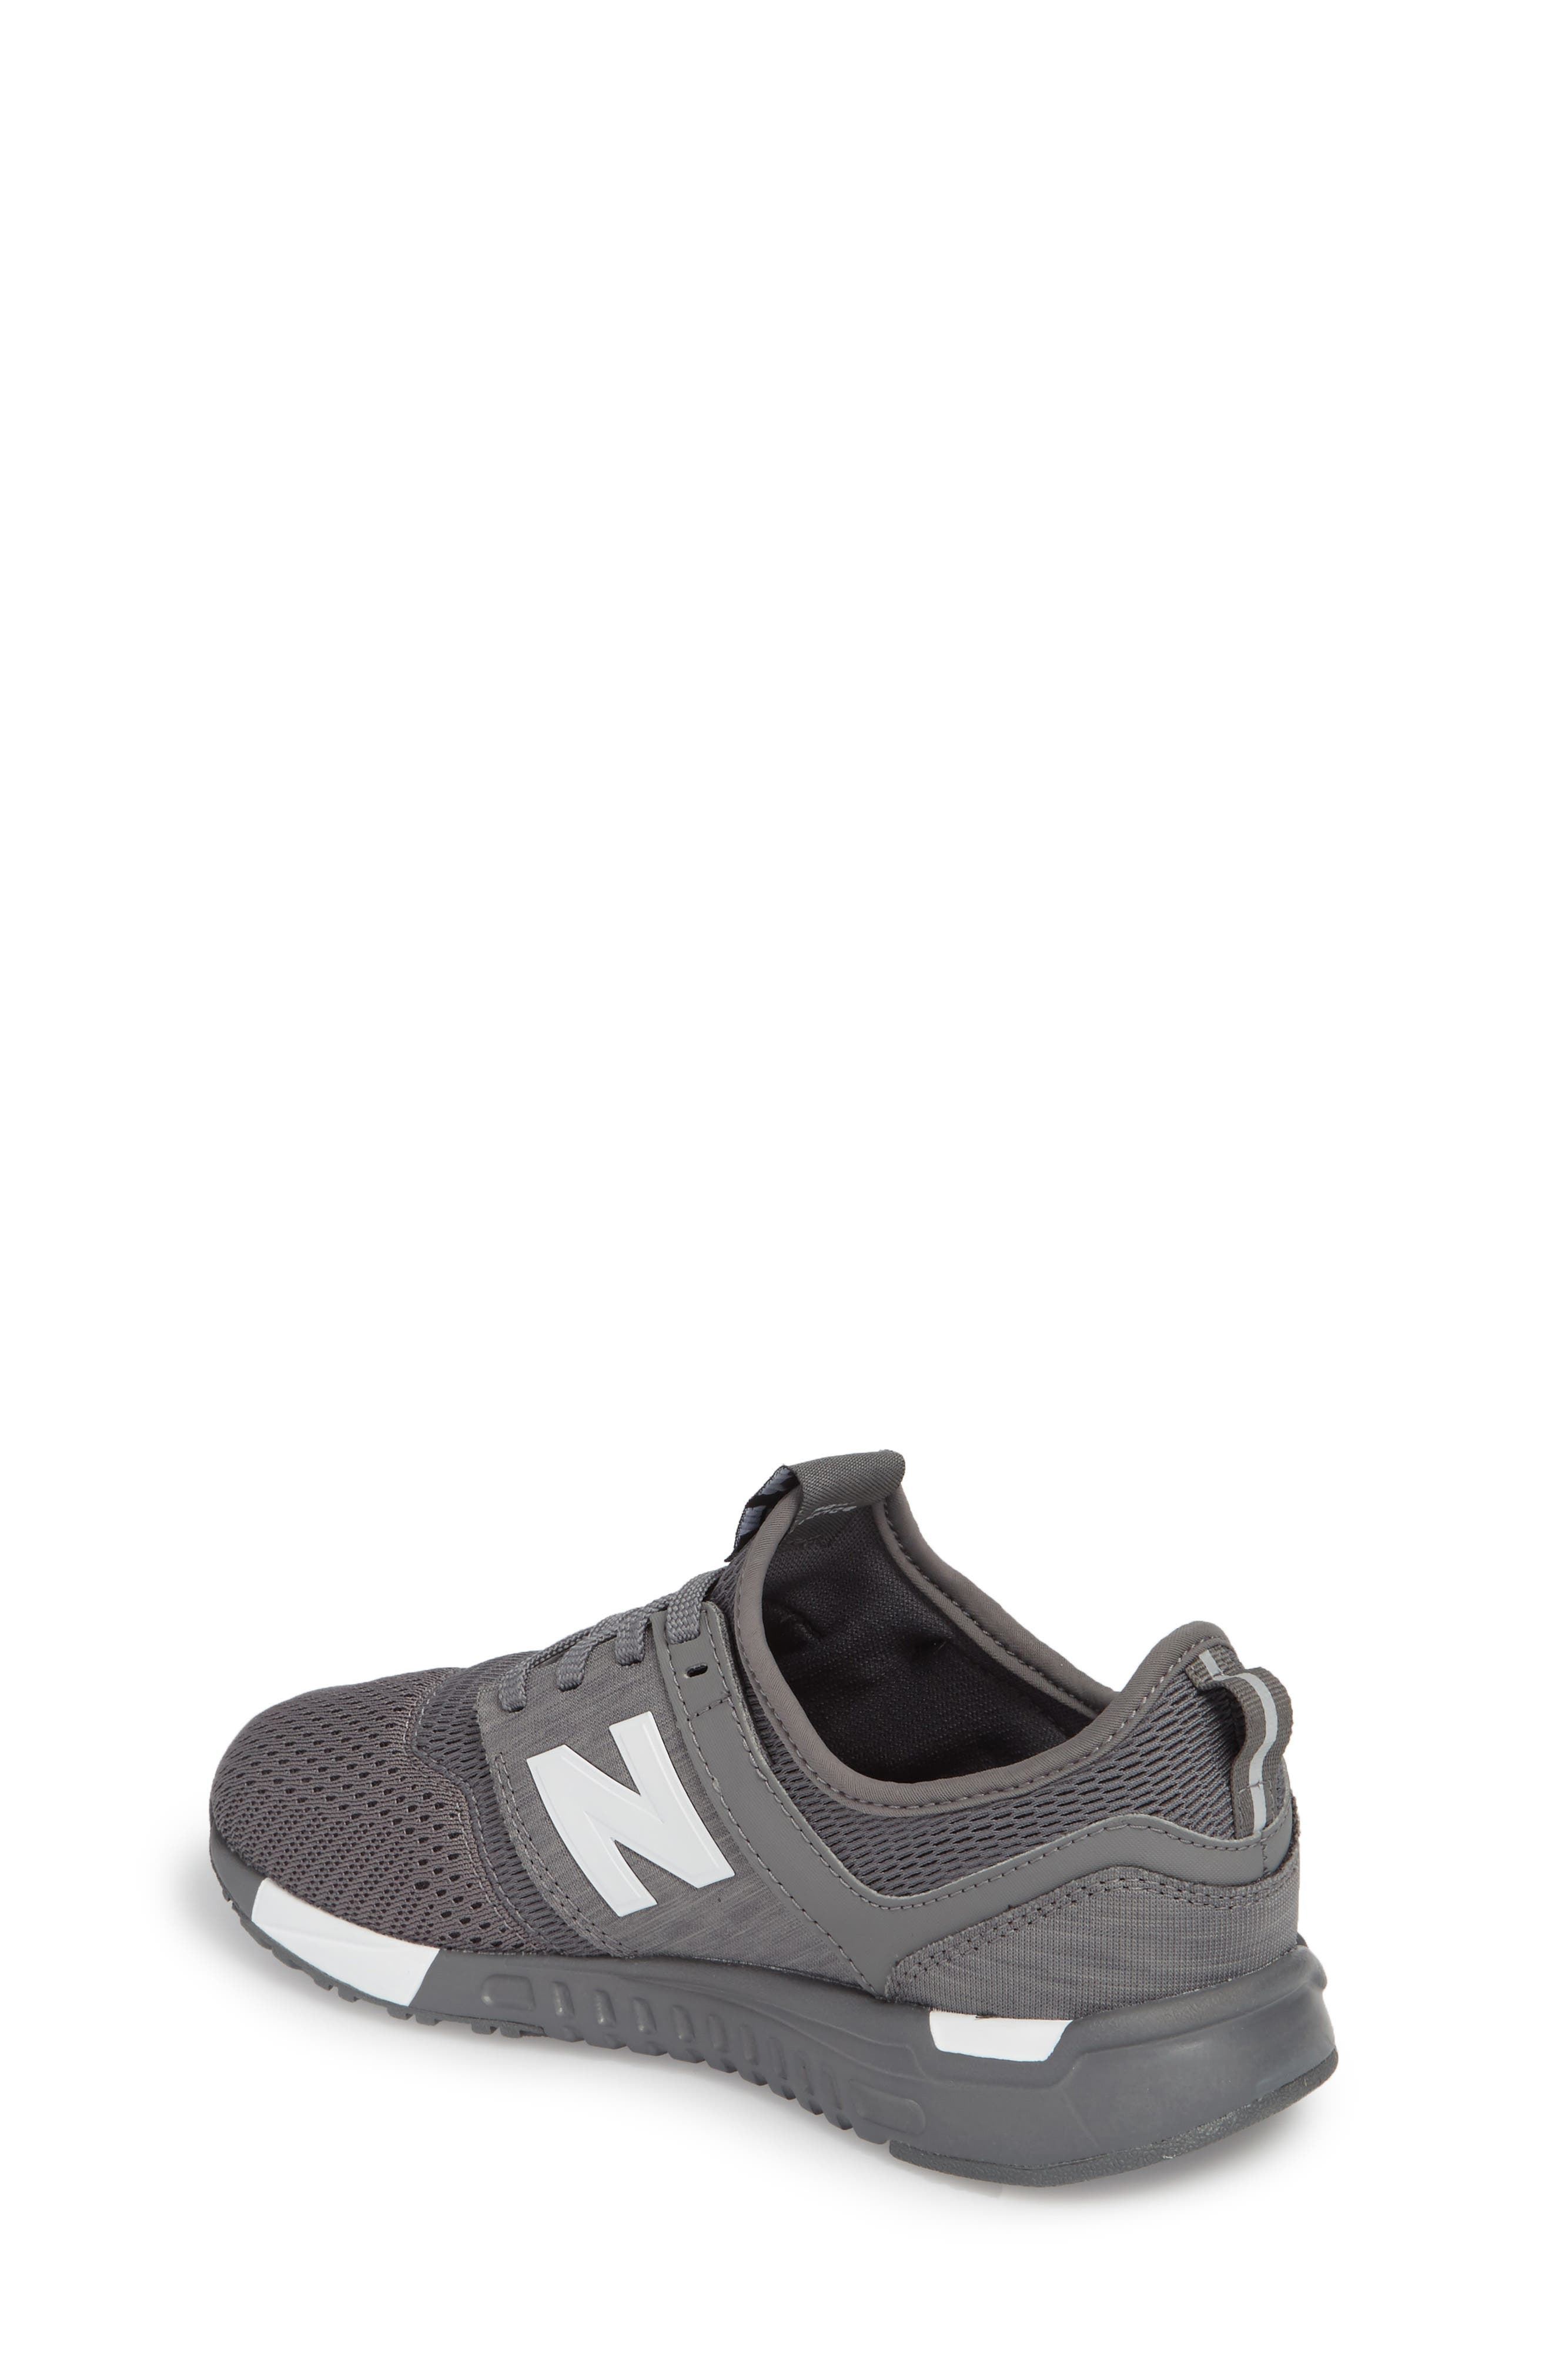 247 Sport Sneaker,                             Alternate thumbnail 2, color,                             Grey/ Black